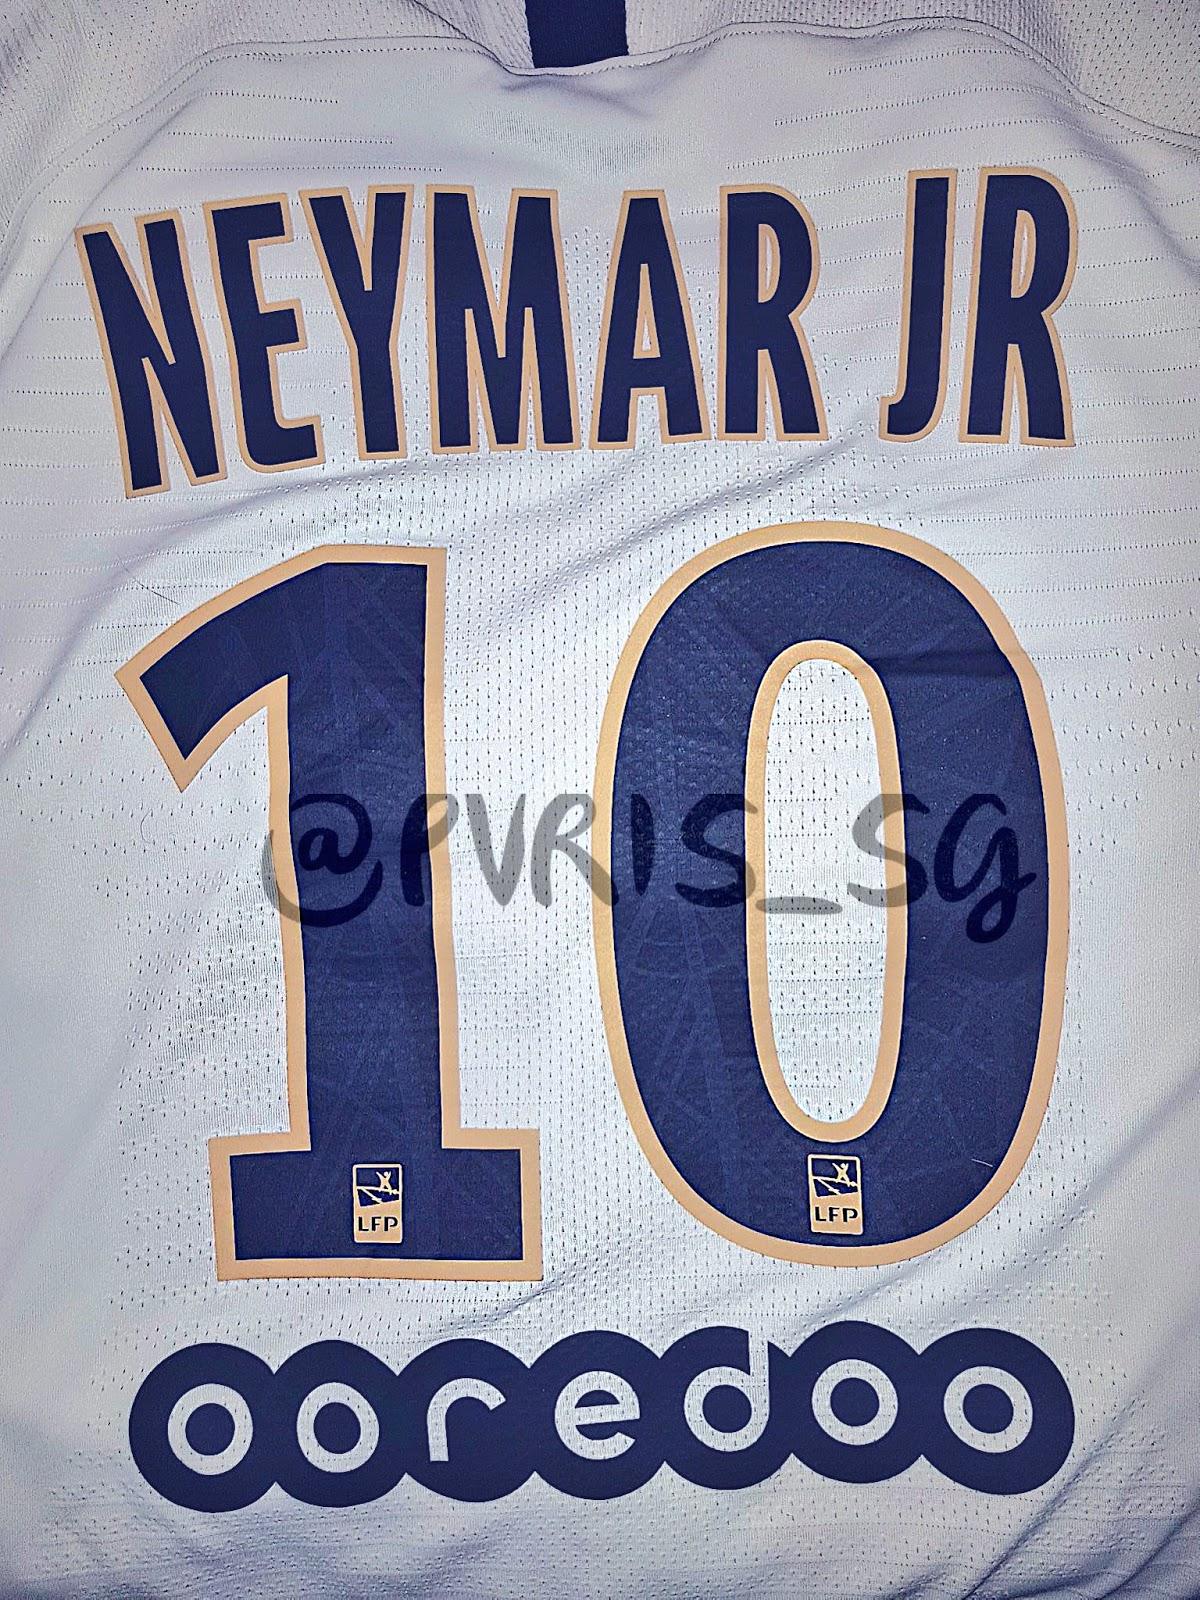 8cd64e2f4cb Update: Special Nike Paris Saint-Germain 18-19 Away Kit Font Revealed